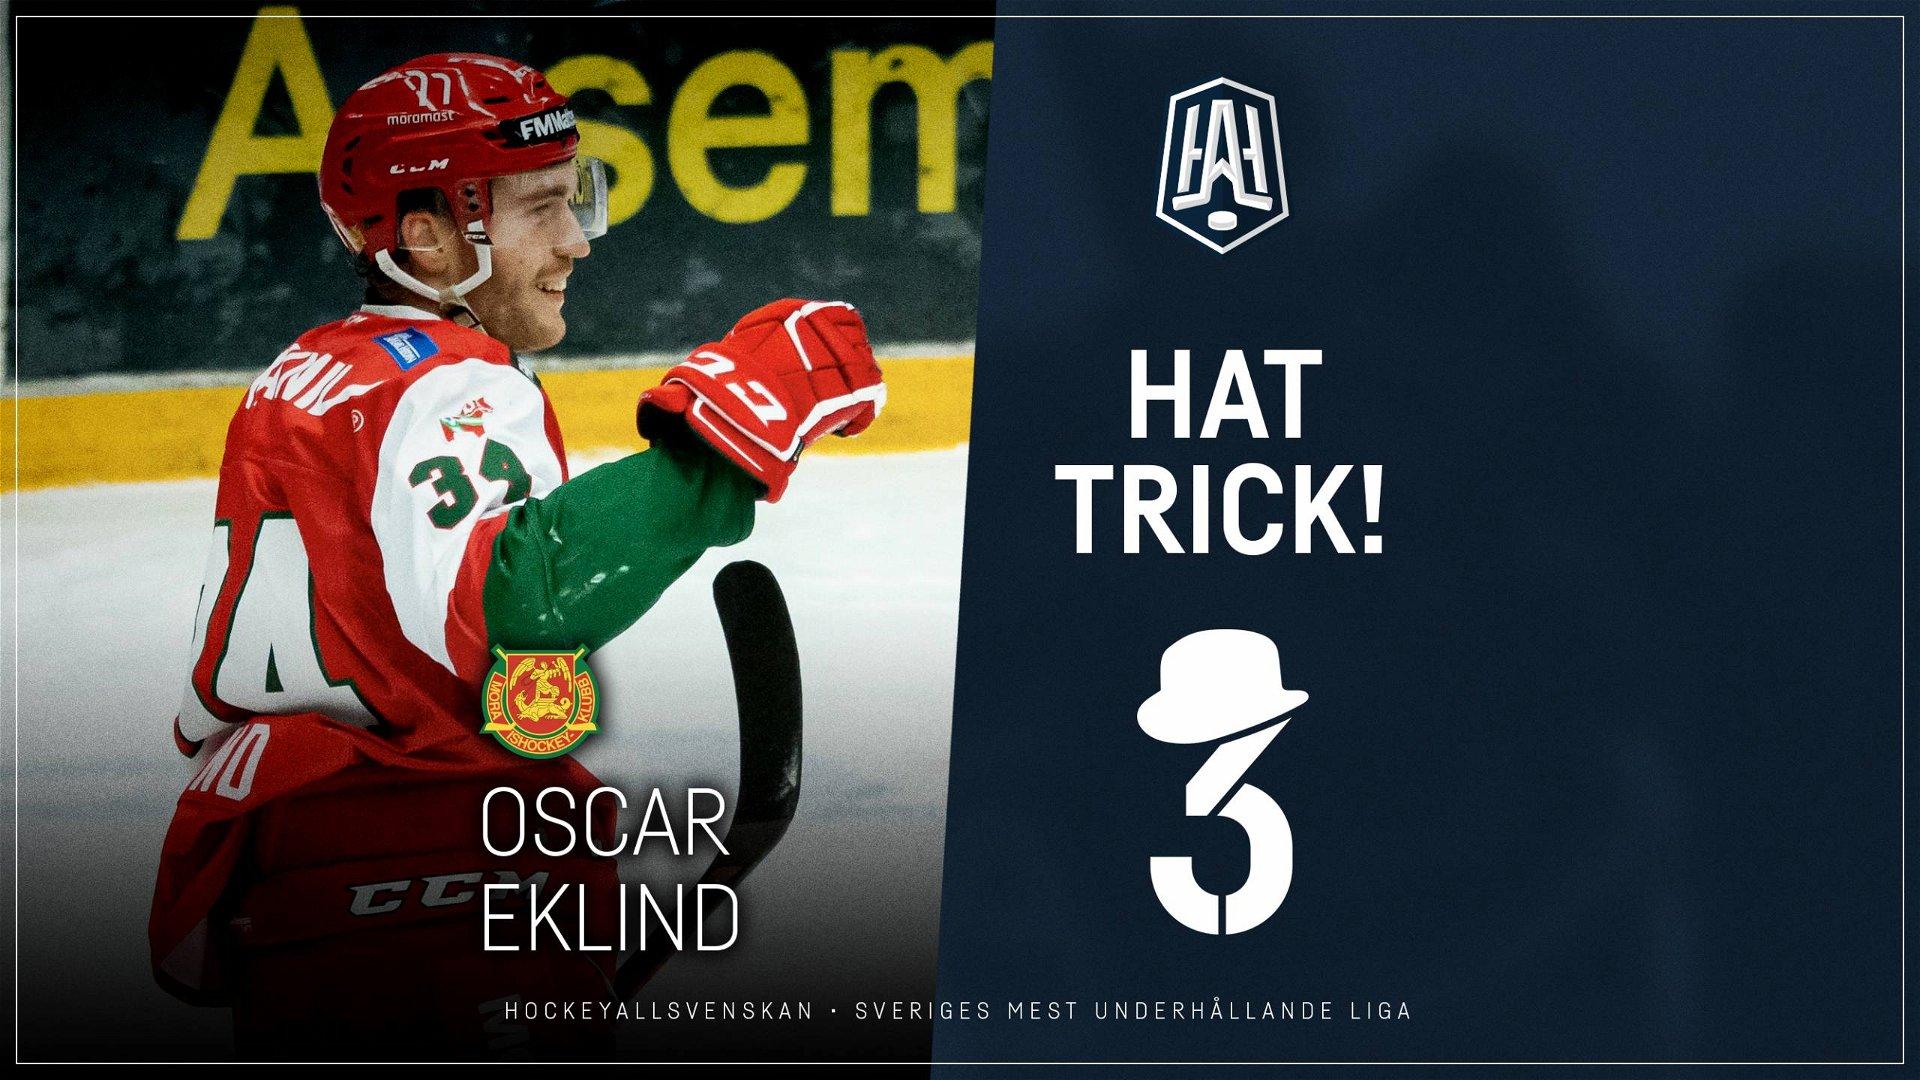 Hattrick: Oscar Eklind, Mora